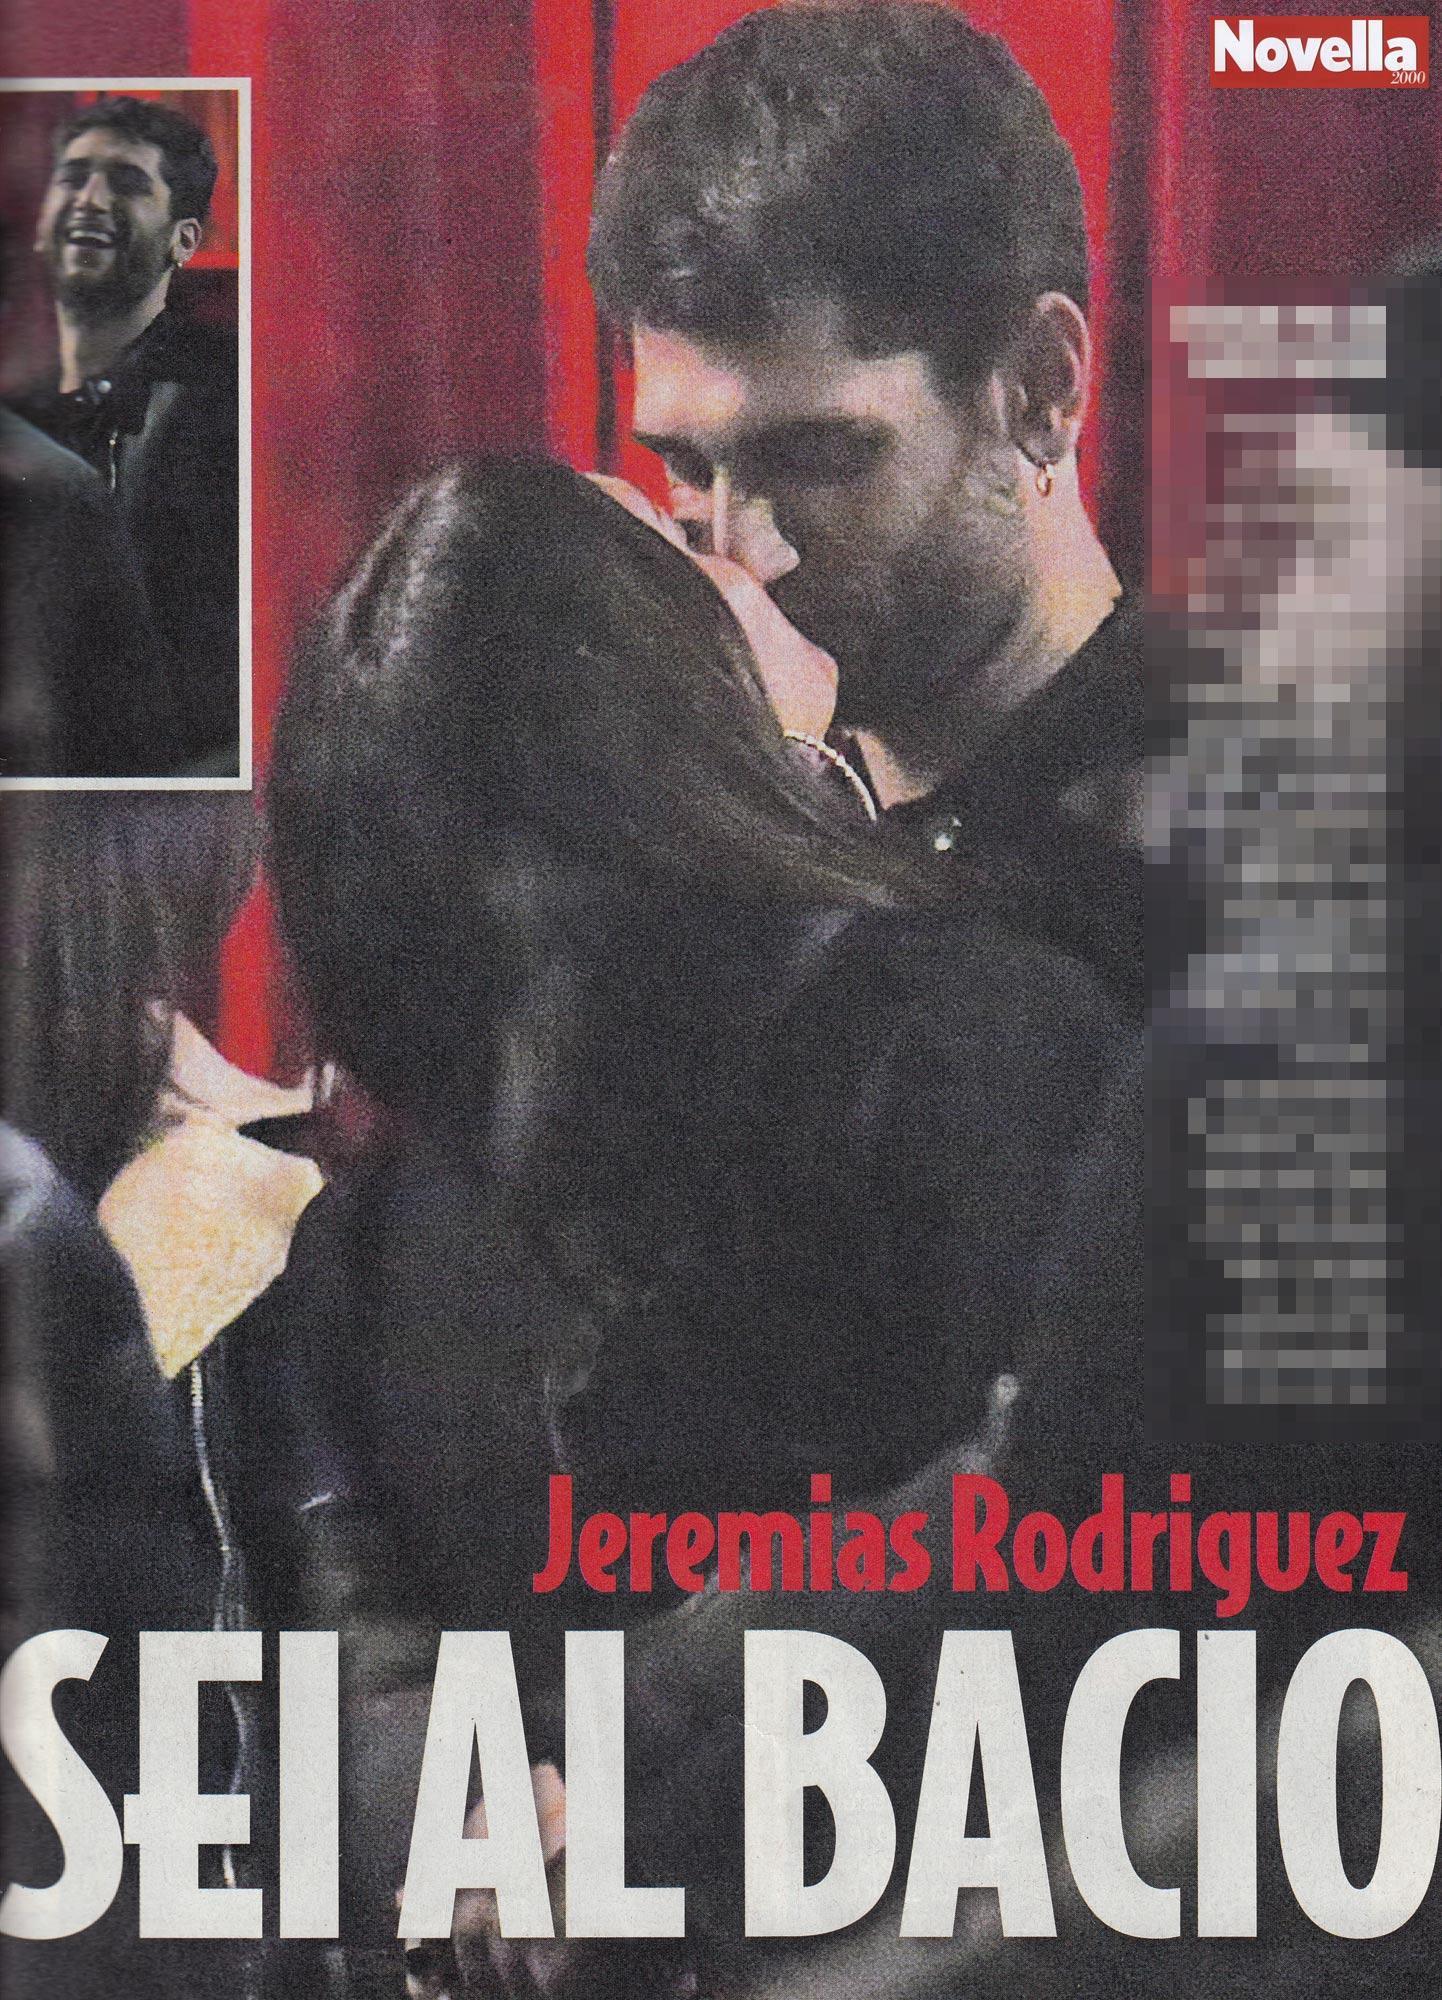 Jeremias Rodriguez, serata al bacio con Sara